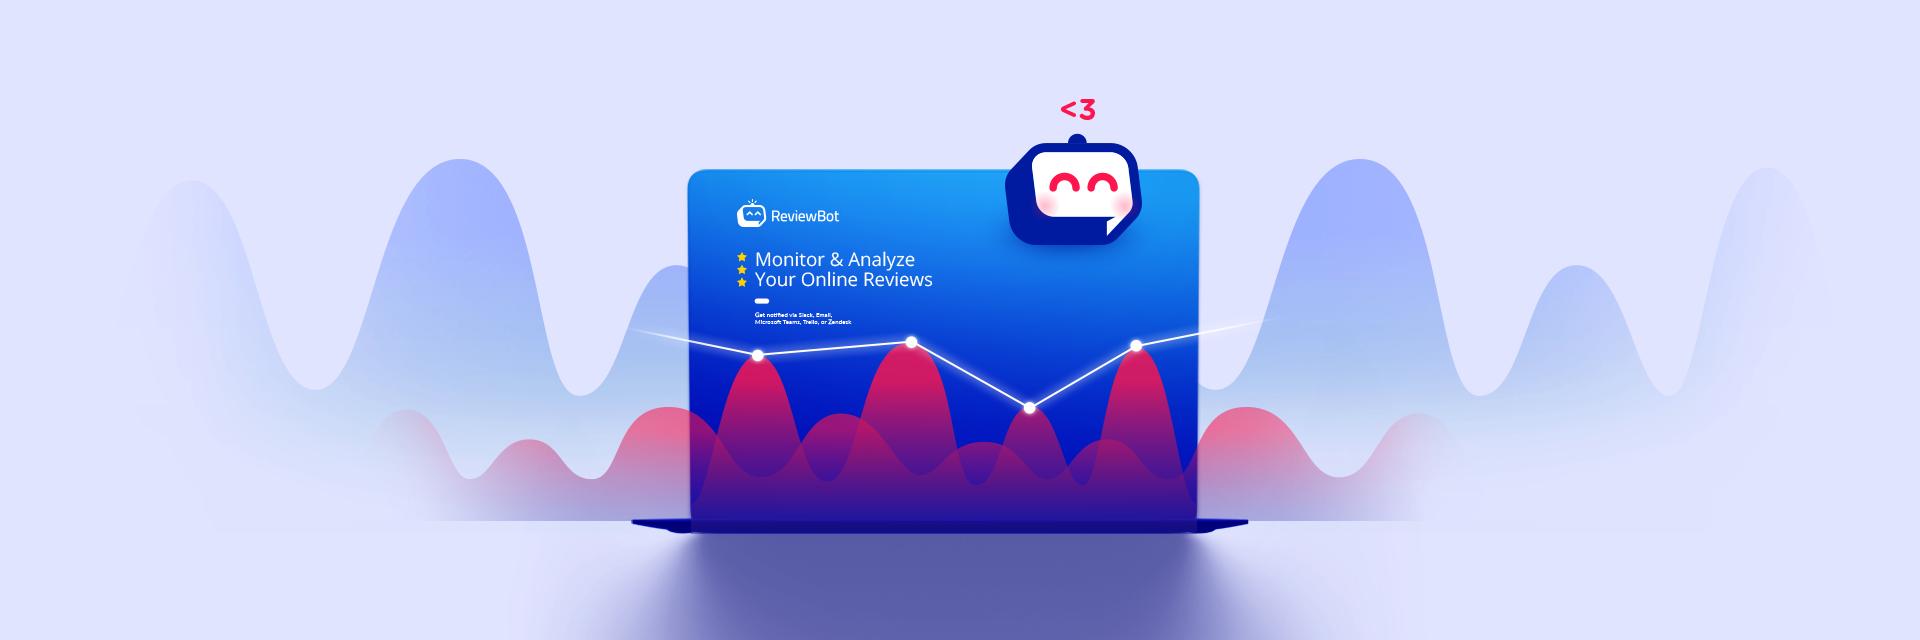 Branding and Digital design, web, ui/ux for a review platform startup